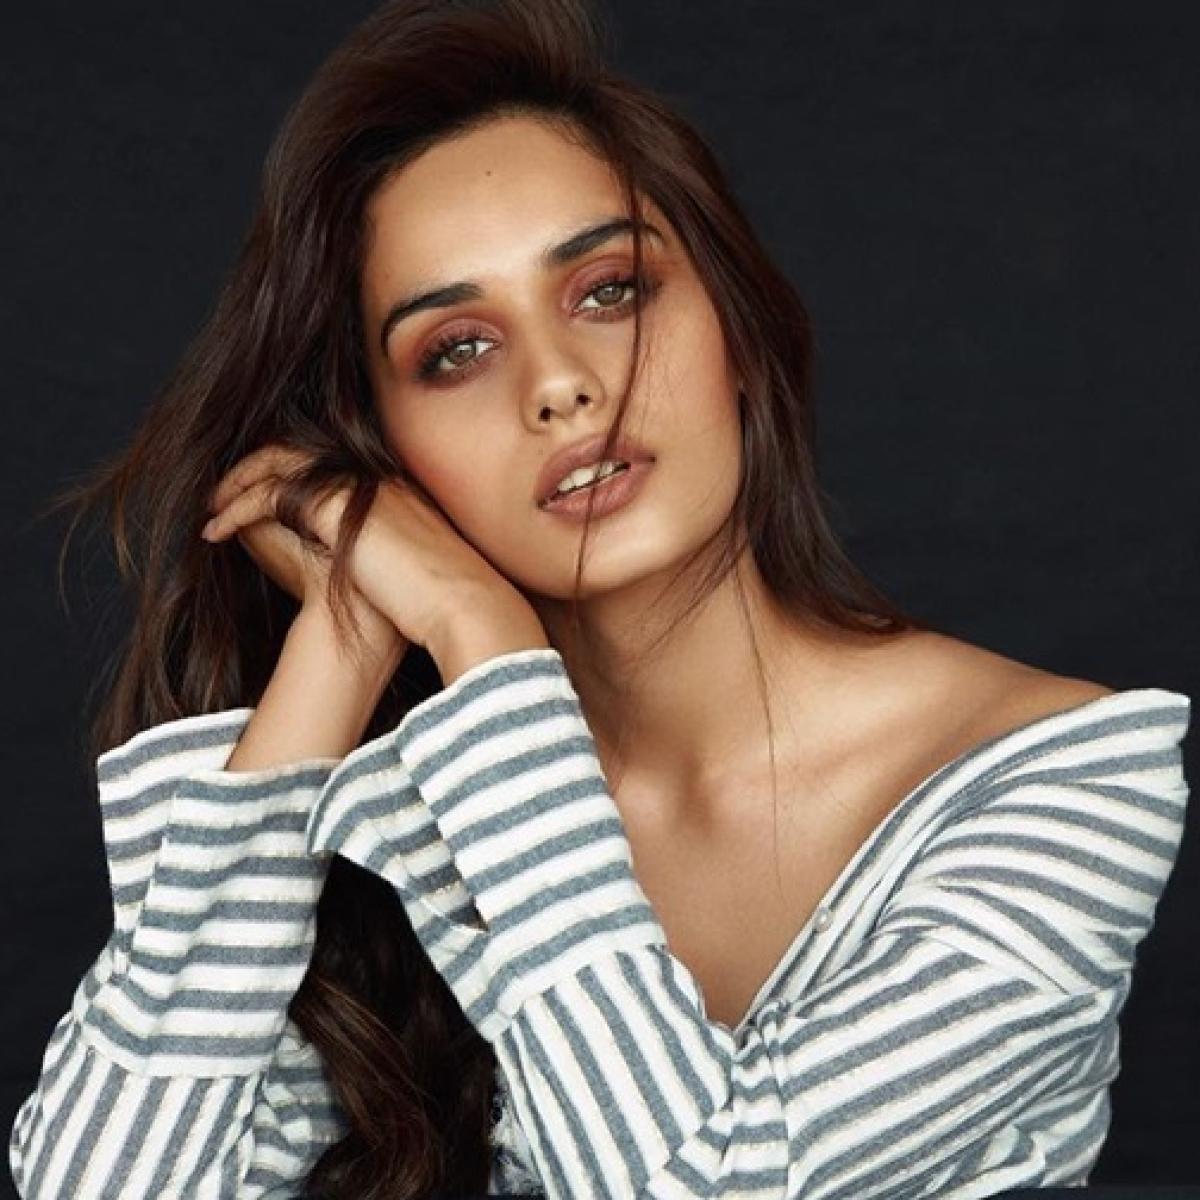 Former Miss World Manushi Chhillar to star opposite Vicky Kaushal in YRF's comic flick